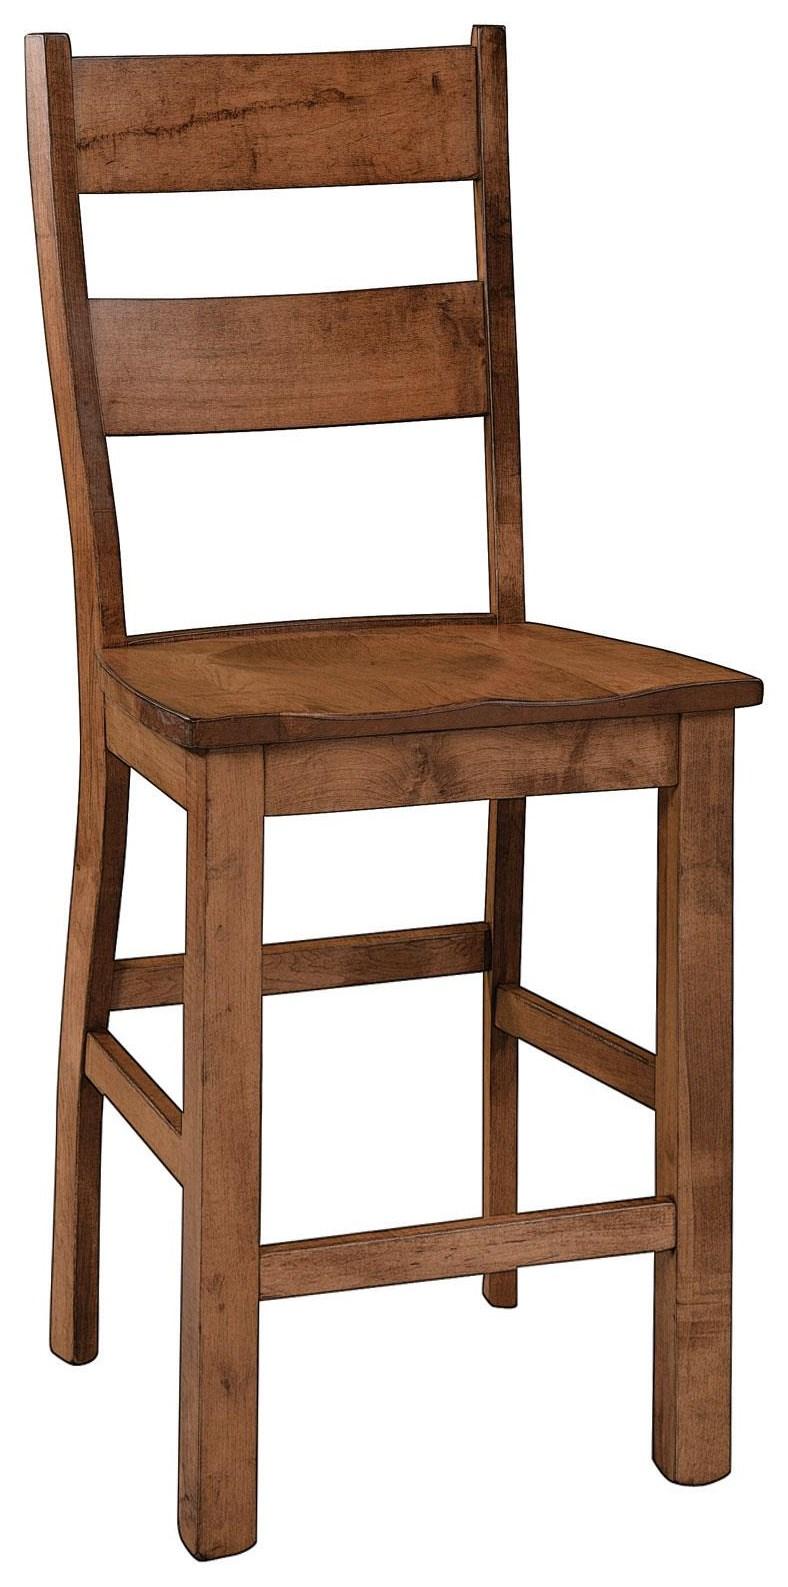 "Amhurst 30"" Stationary Stool by Wengerd Wood Products at Wayside Furniture"